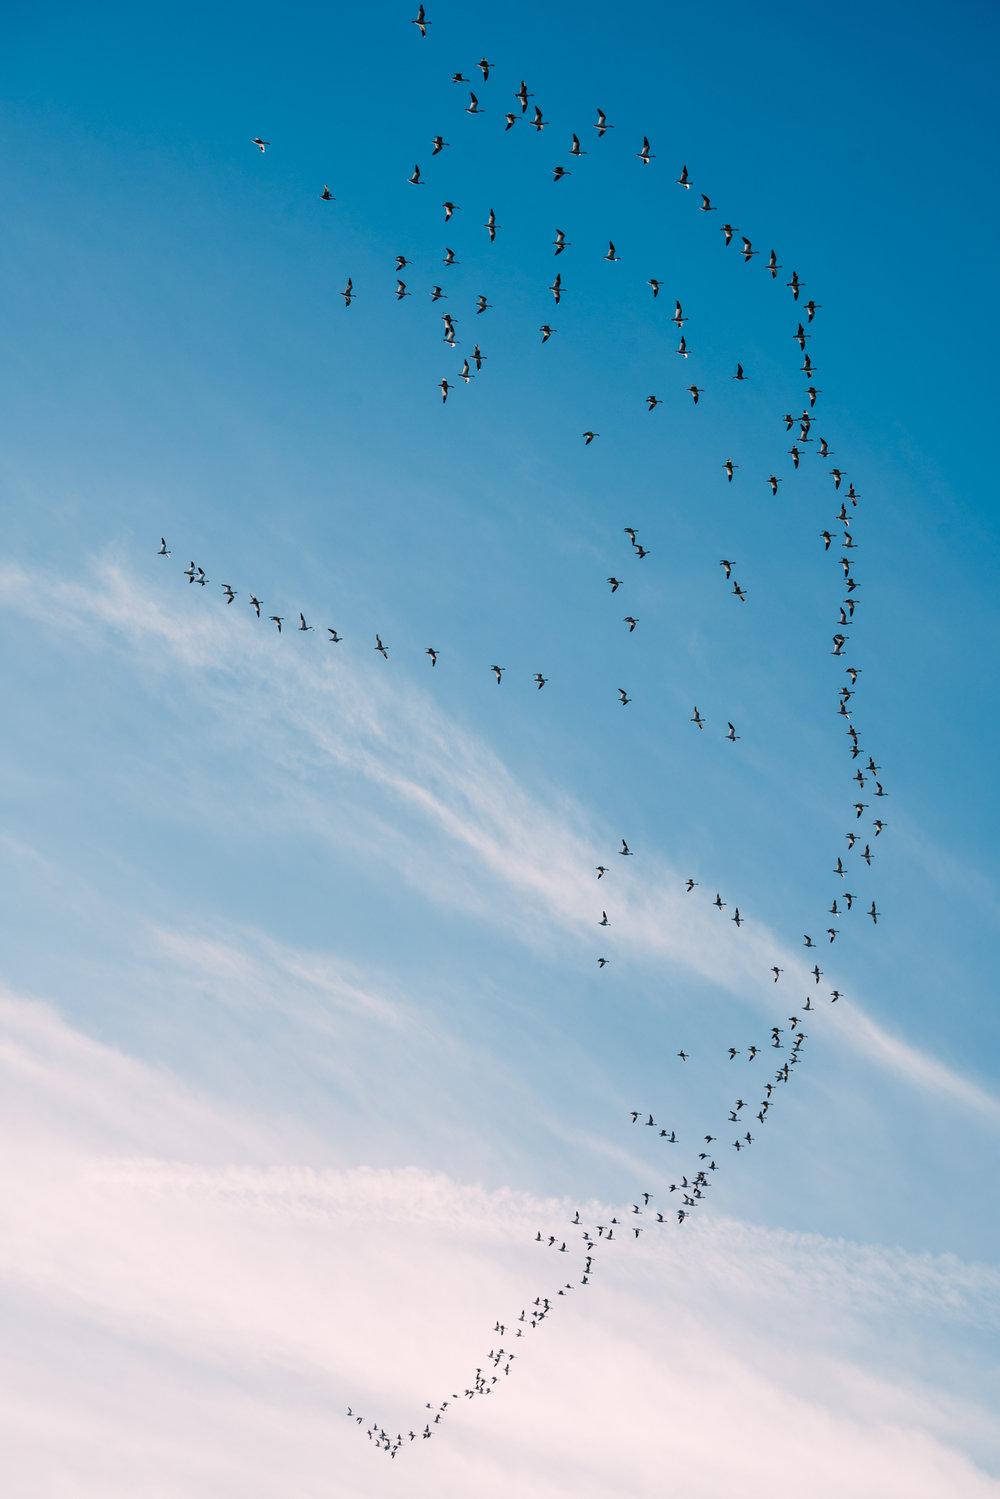 Skagit Delta Goose Chase web-03317.jpg